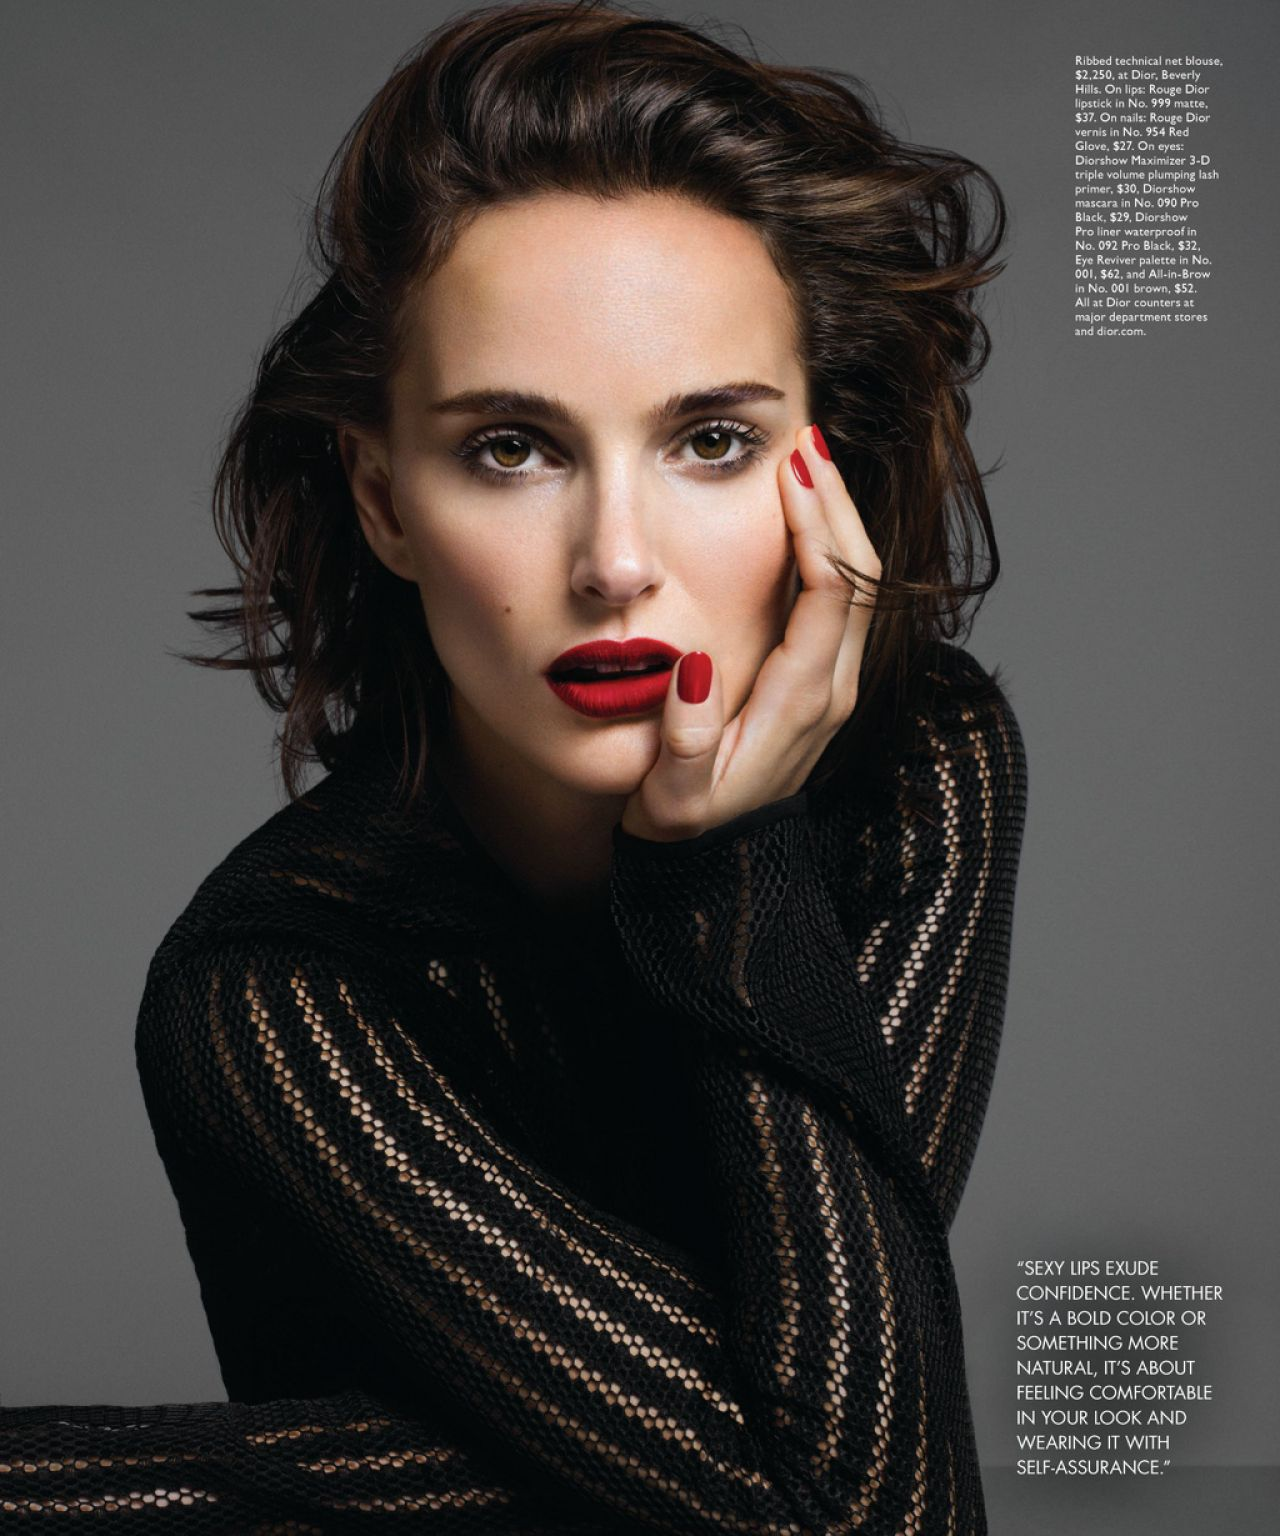 Natalie Portman - Modern Luxury Angeleno & Miami ... Natalie Portman